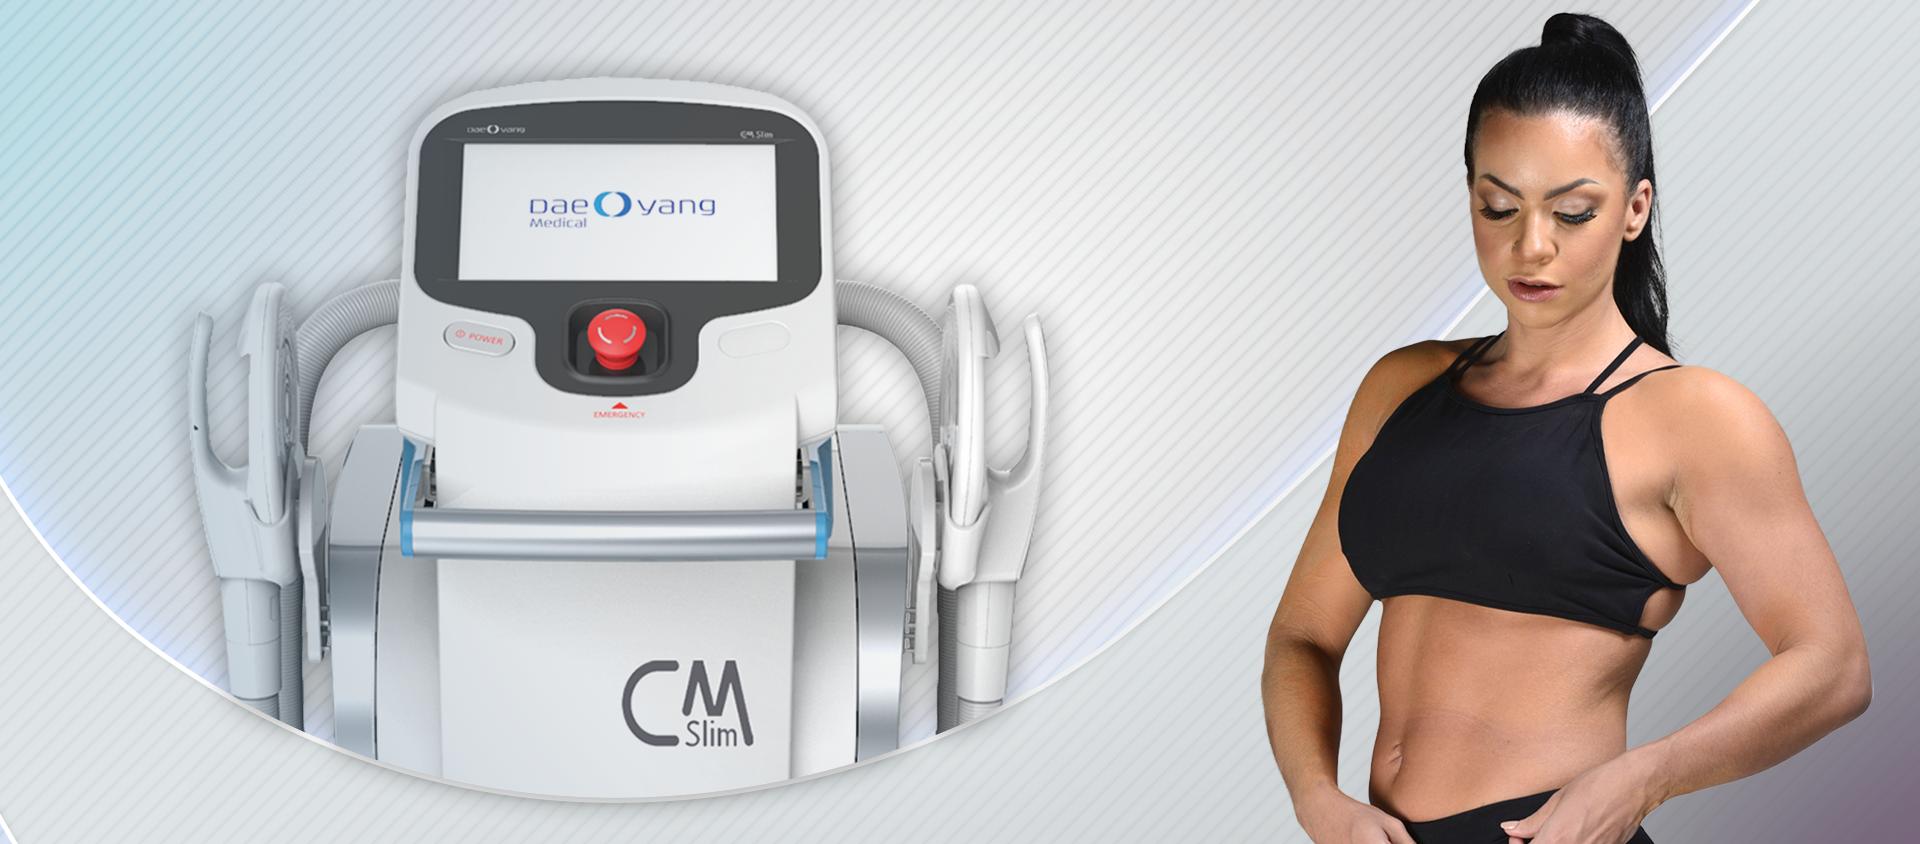 CMSlim tencologia de campo eletromagnético que tonifica fortalece e defini os músculos e reduz flacidez